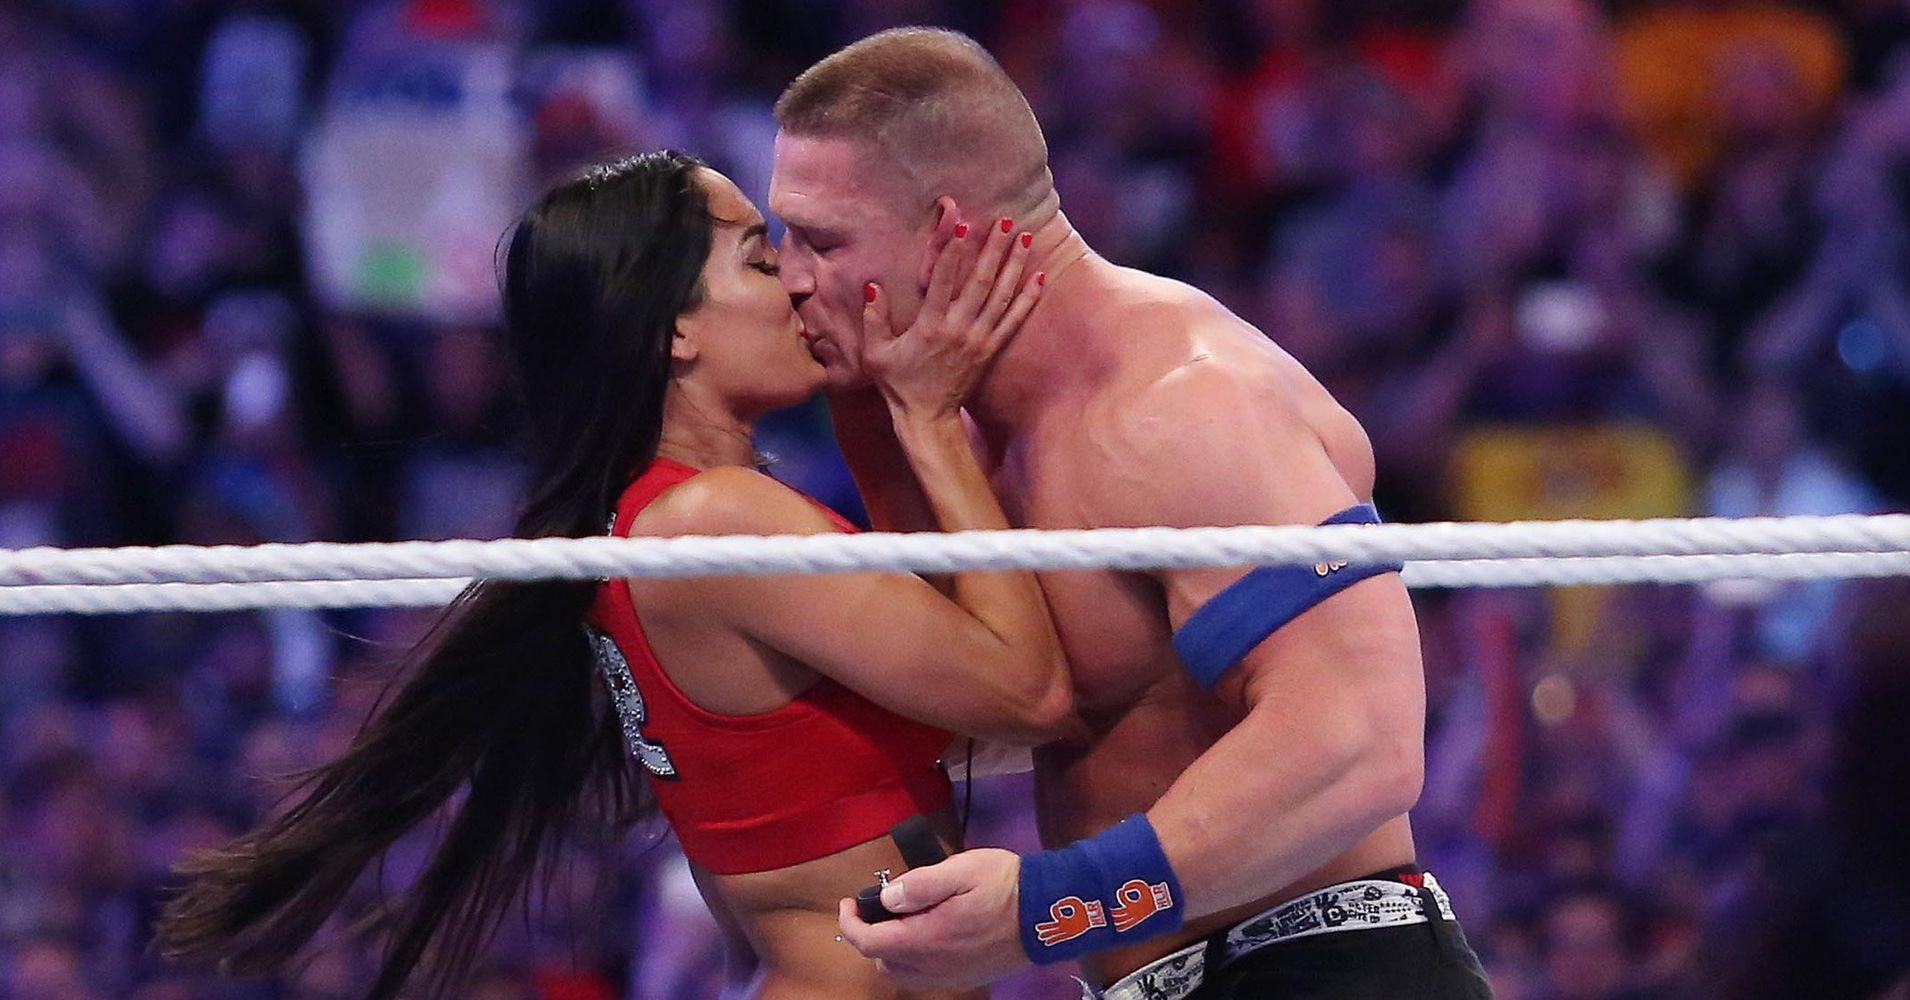 John Cena Popped The Question To Nikki Bella During WrestleMania 33 ...